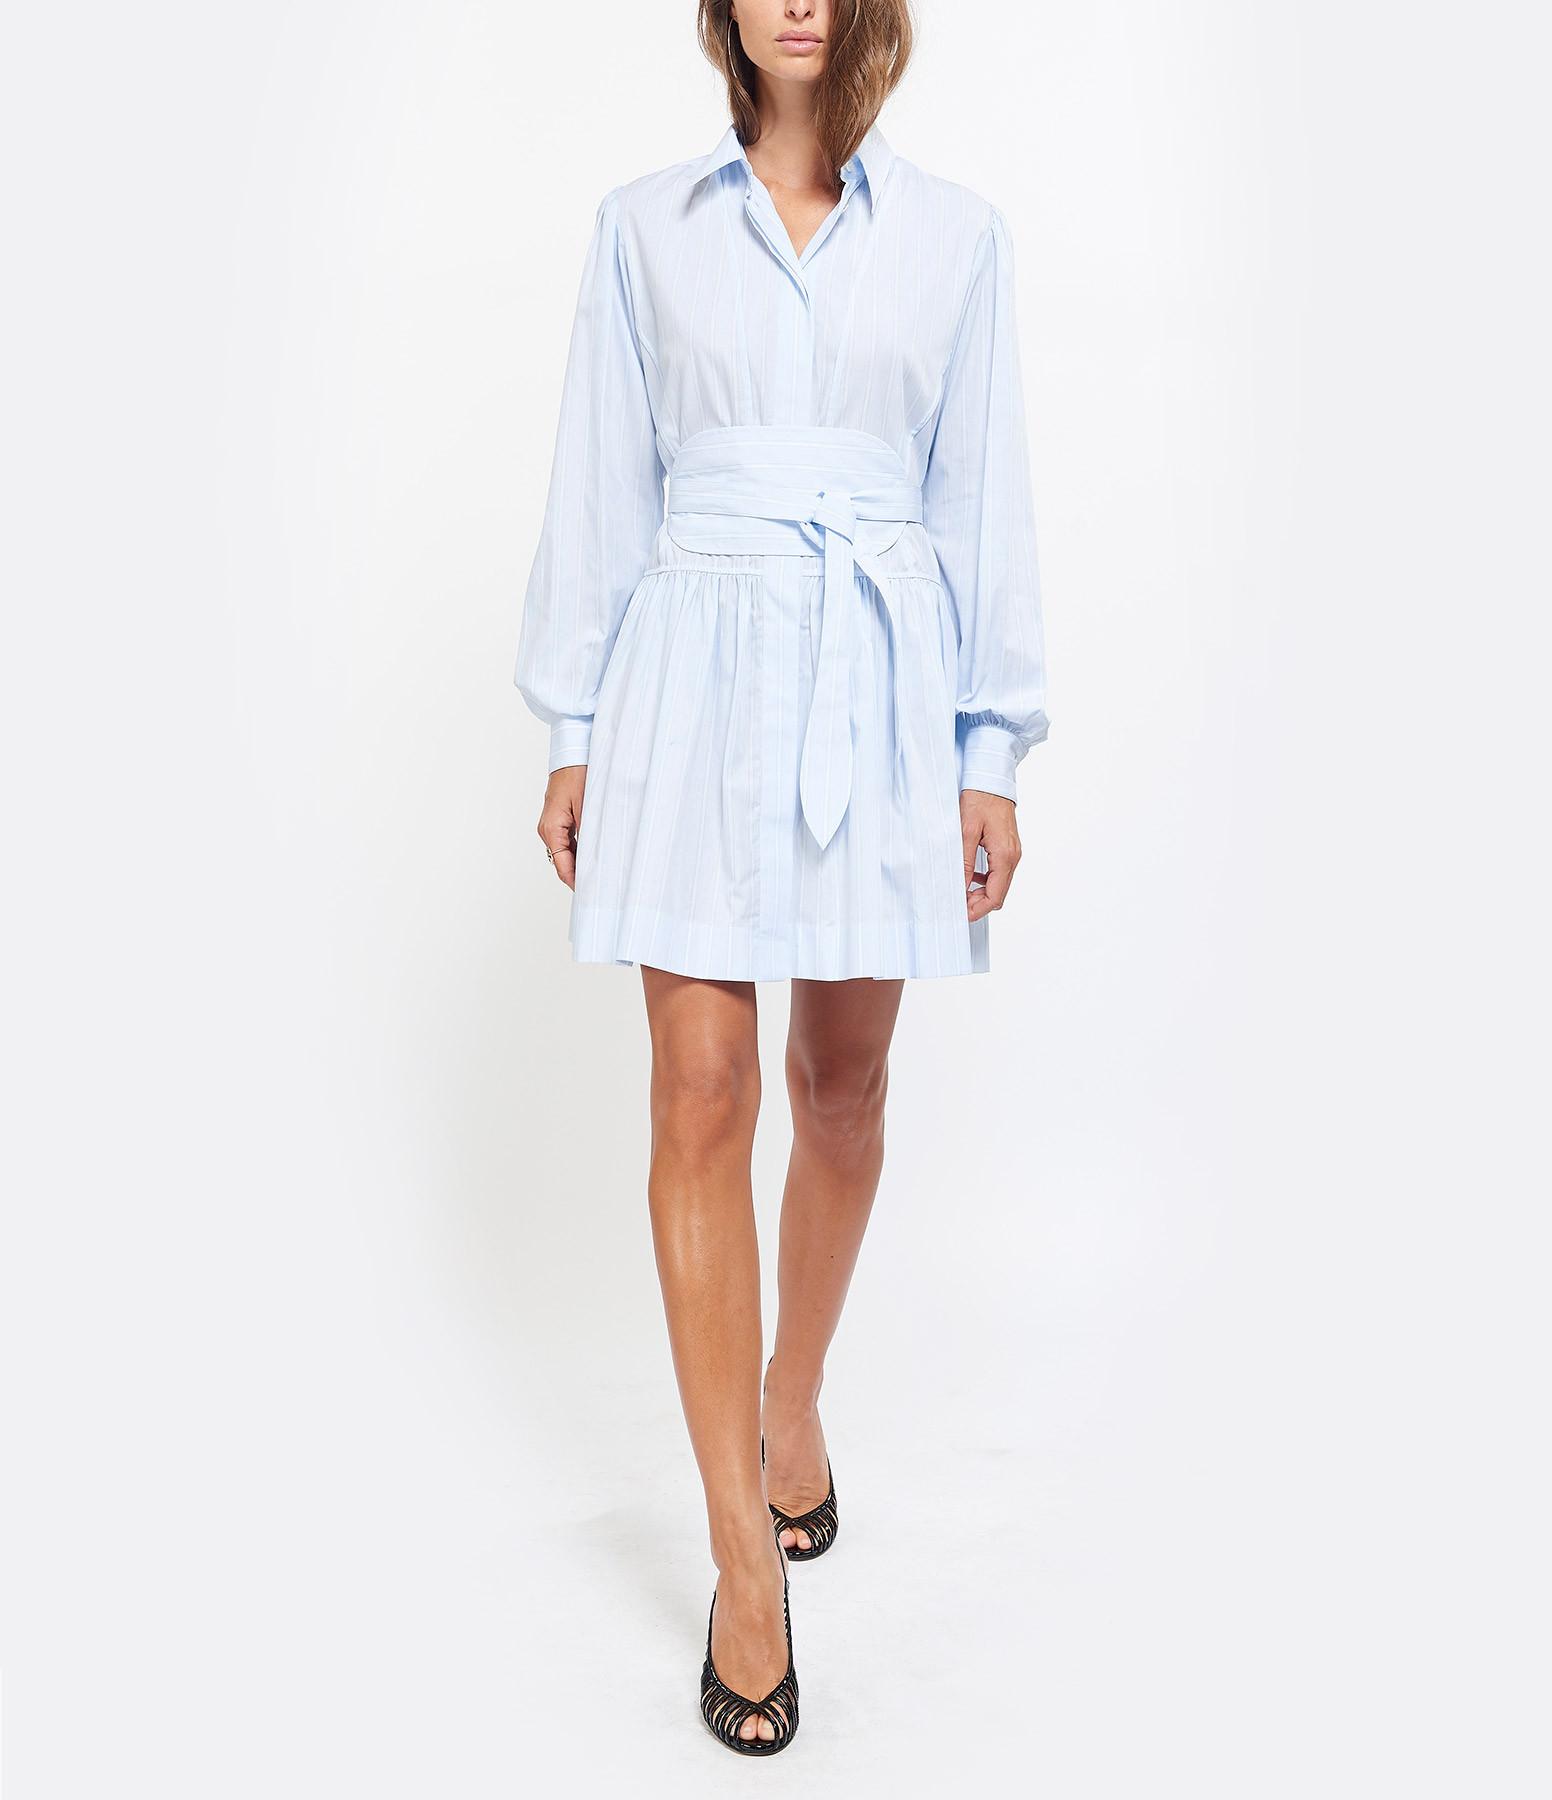 ALEXA CHUNG - Robe Chemise Rayures Coton Bleu